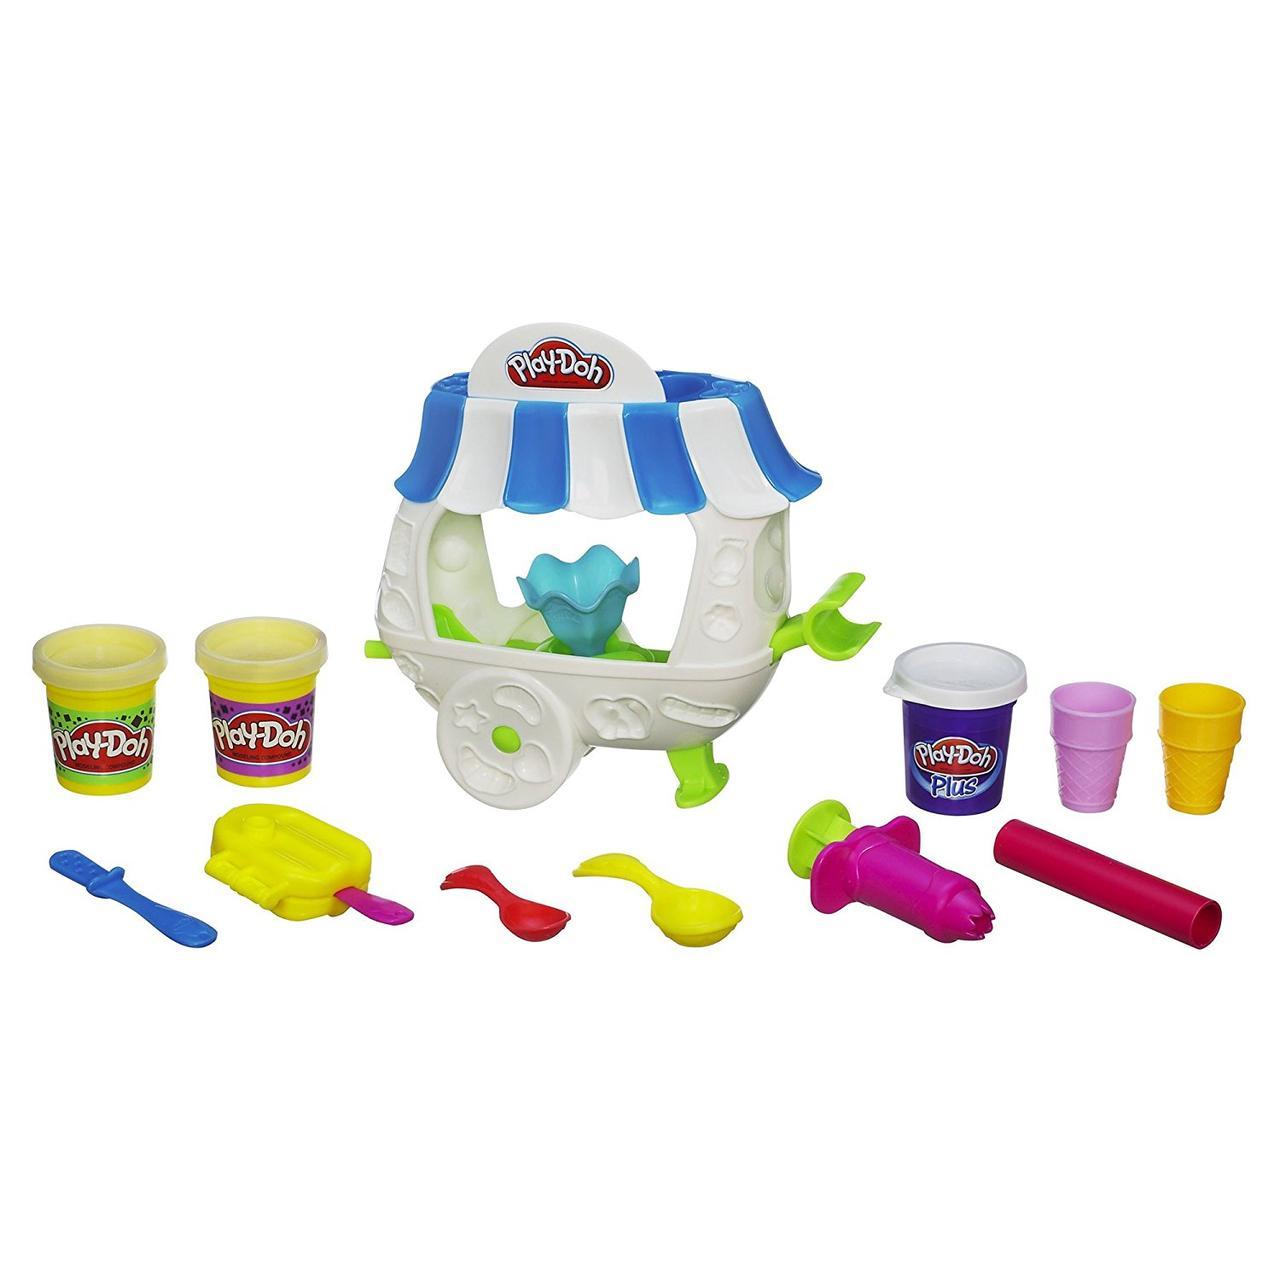 Набор Плэй до Фургончик Мороженого (Play-Doh Sweet Shoppe Ice Cream Sundae Cart Playset)